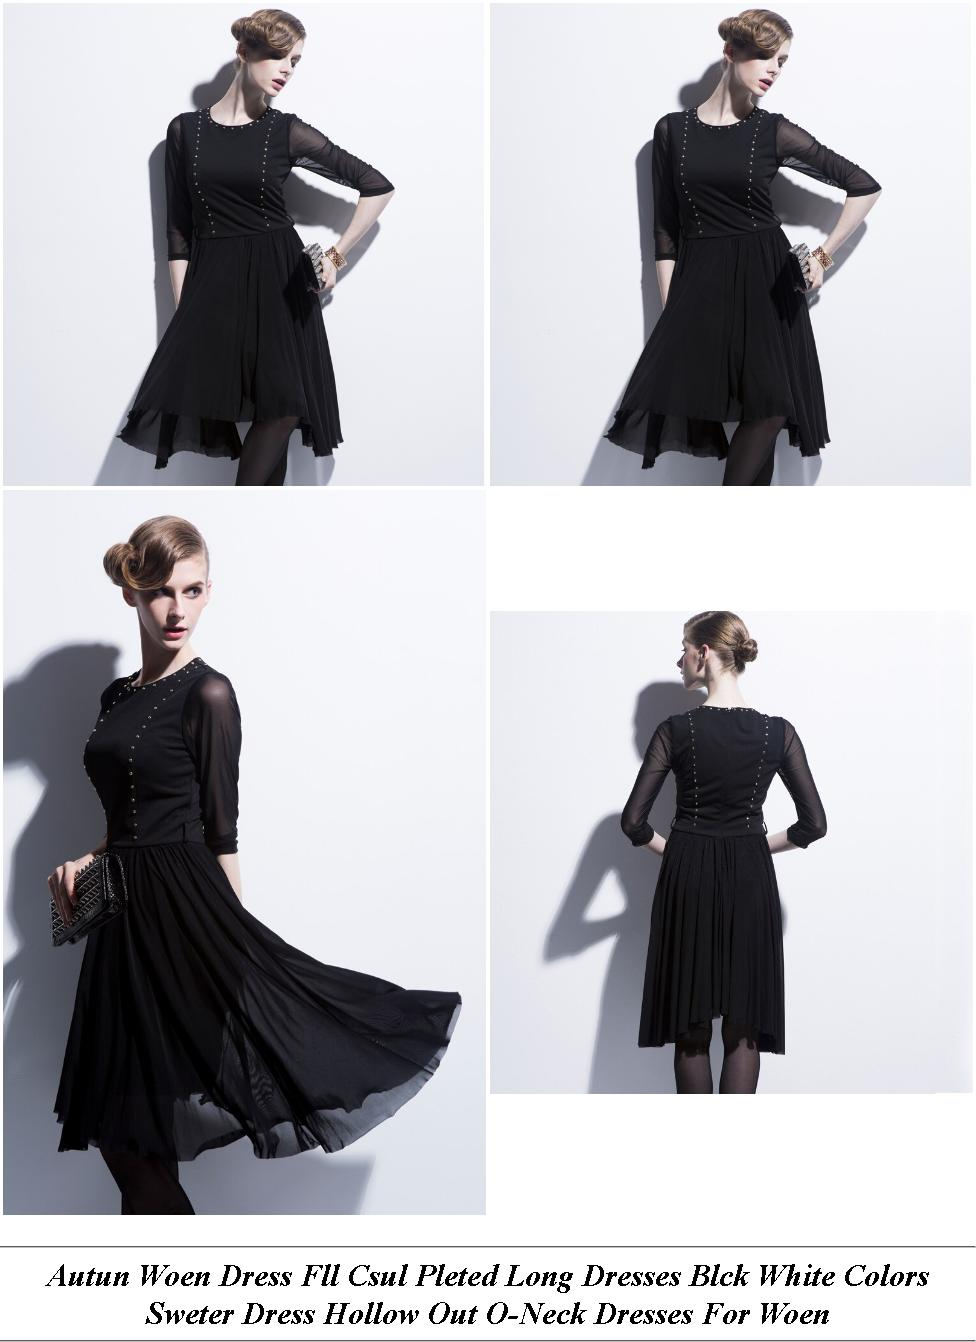 Cocktail Dresses For Women - Womens Summer Dresses On Sale - Sheath Dress - Cheap Ladies Clothes